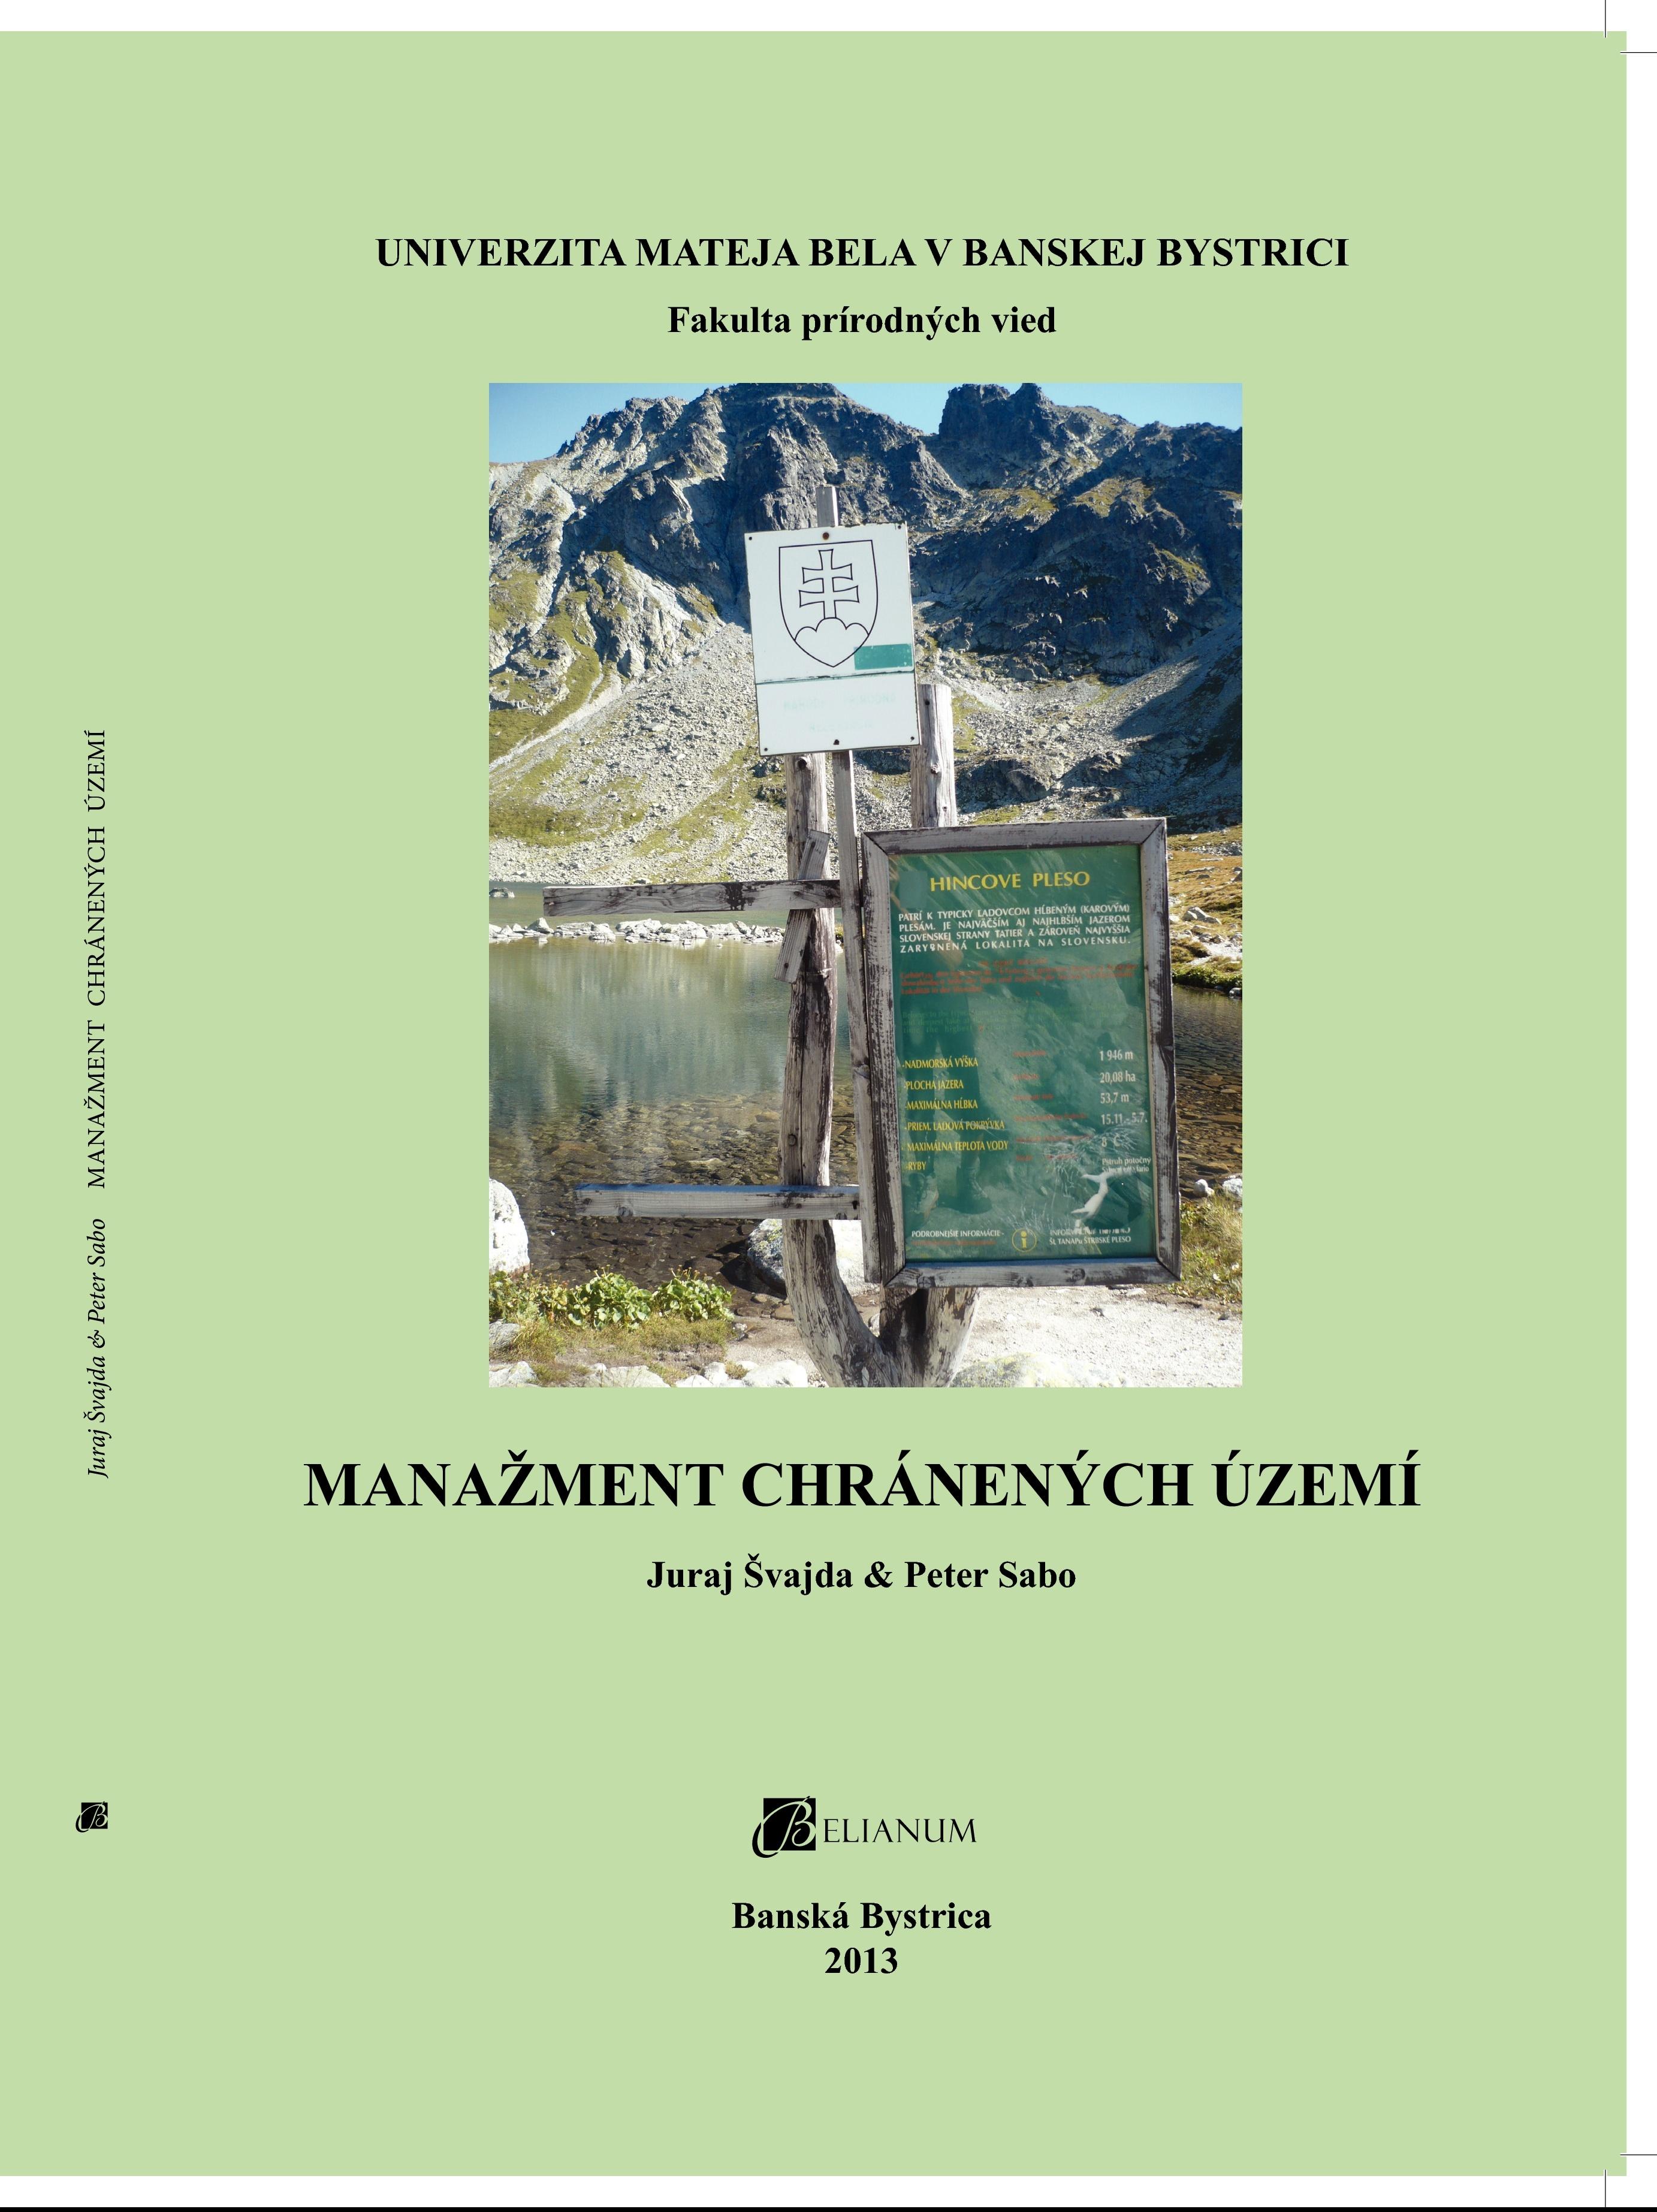 Manažment chránených území